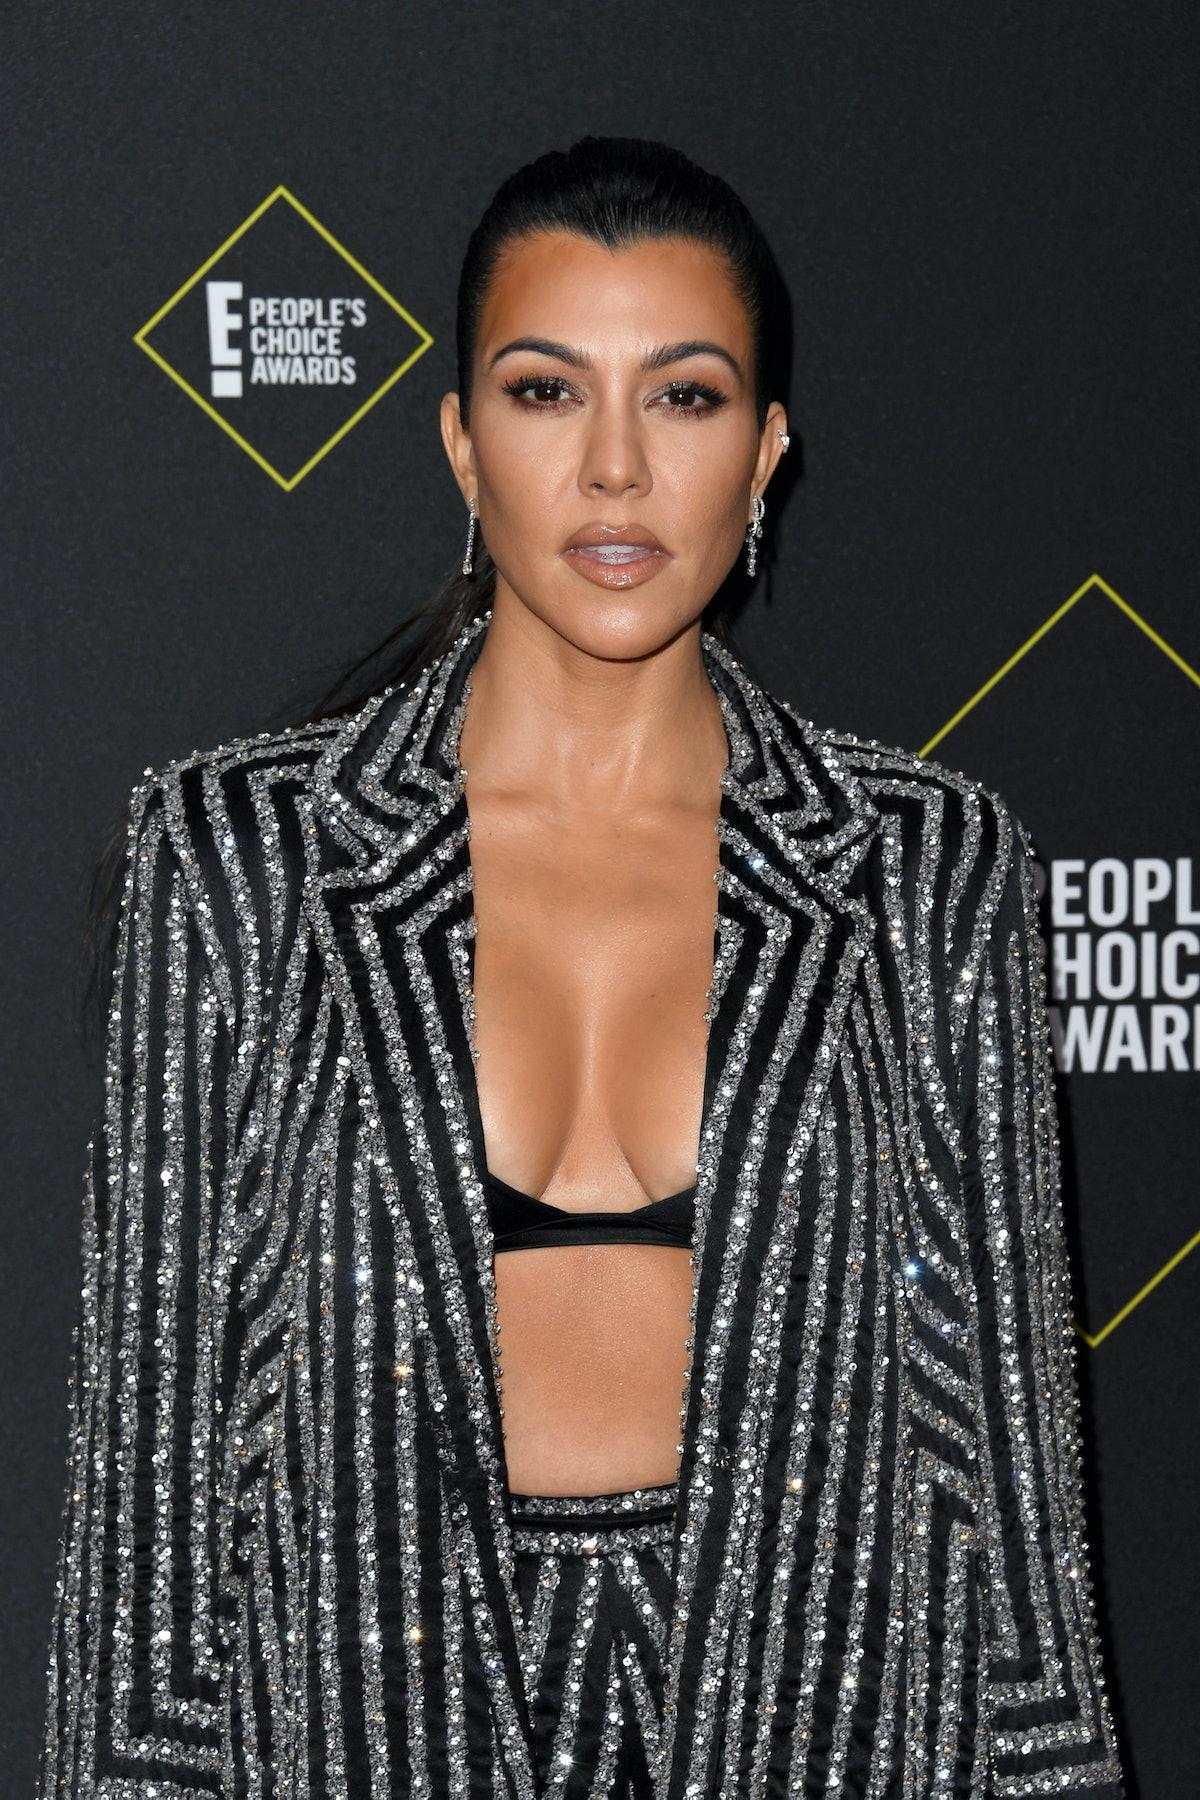 SANTA MONICA, CALIFORNIA - NOVEMBER 10: Kourtney Kardashian attends the 2019 E! People's Choice Awards at Barker Hangar on November 10, 2019 in Santa Monica, California. (Photo by Jon Kopaloff/FilmMagic)